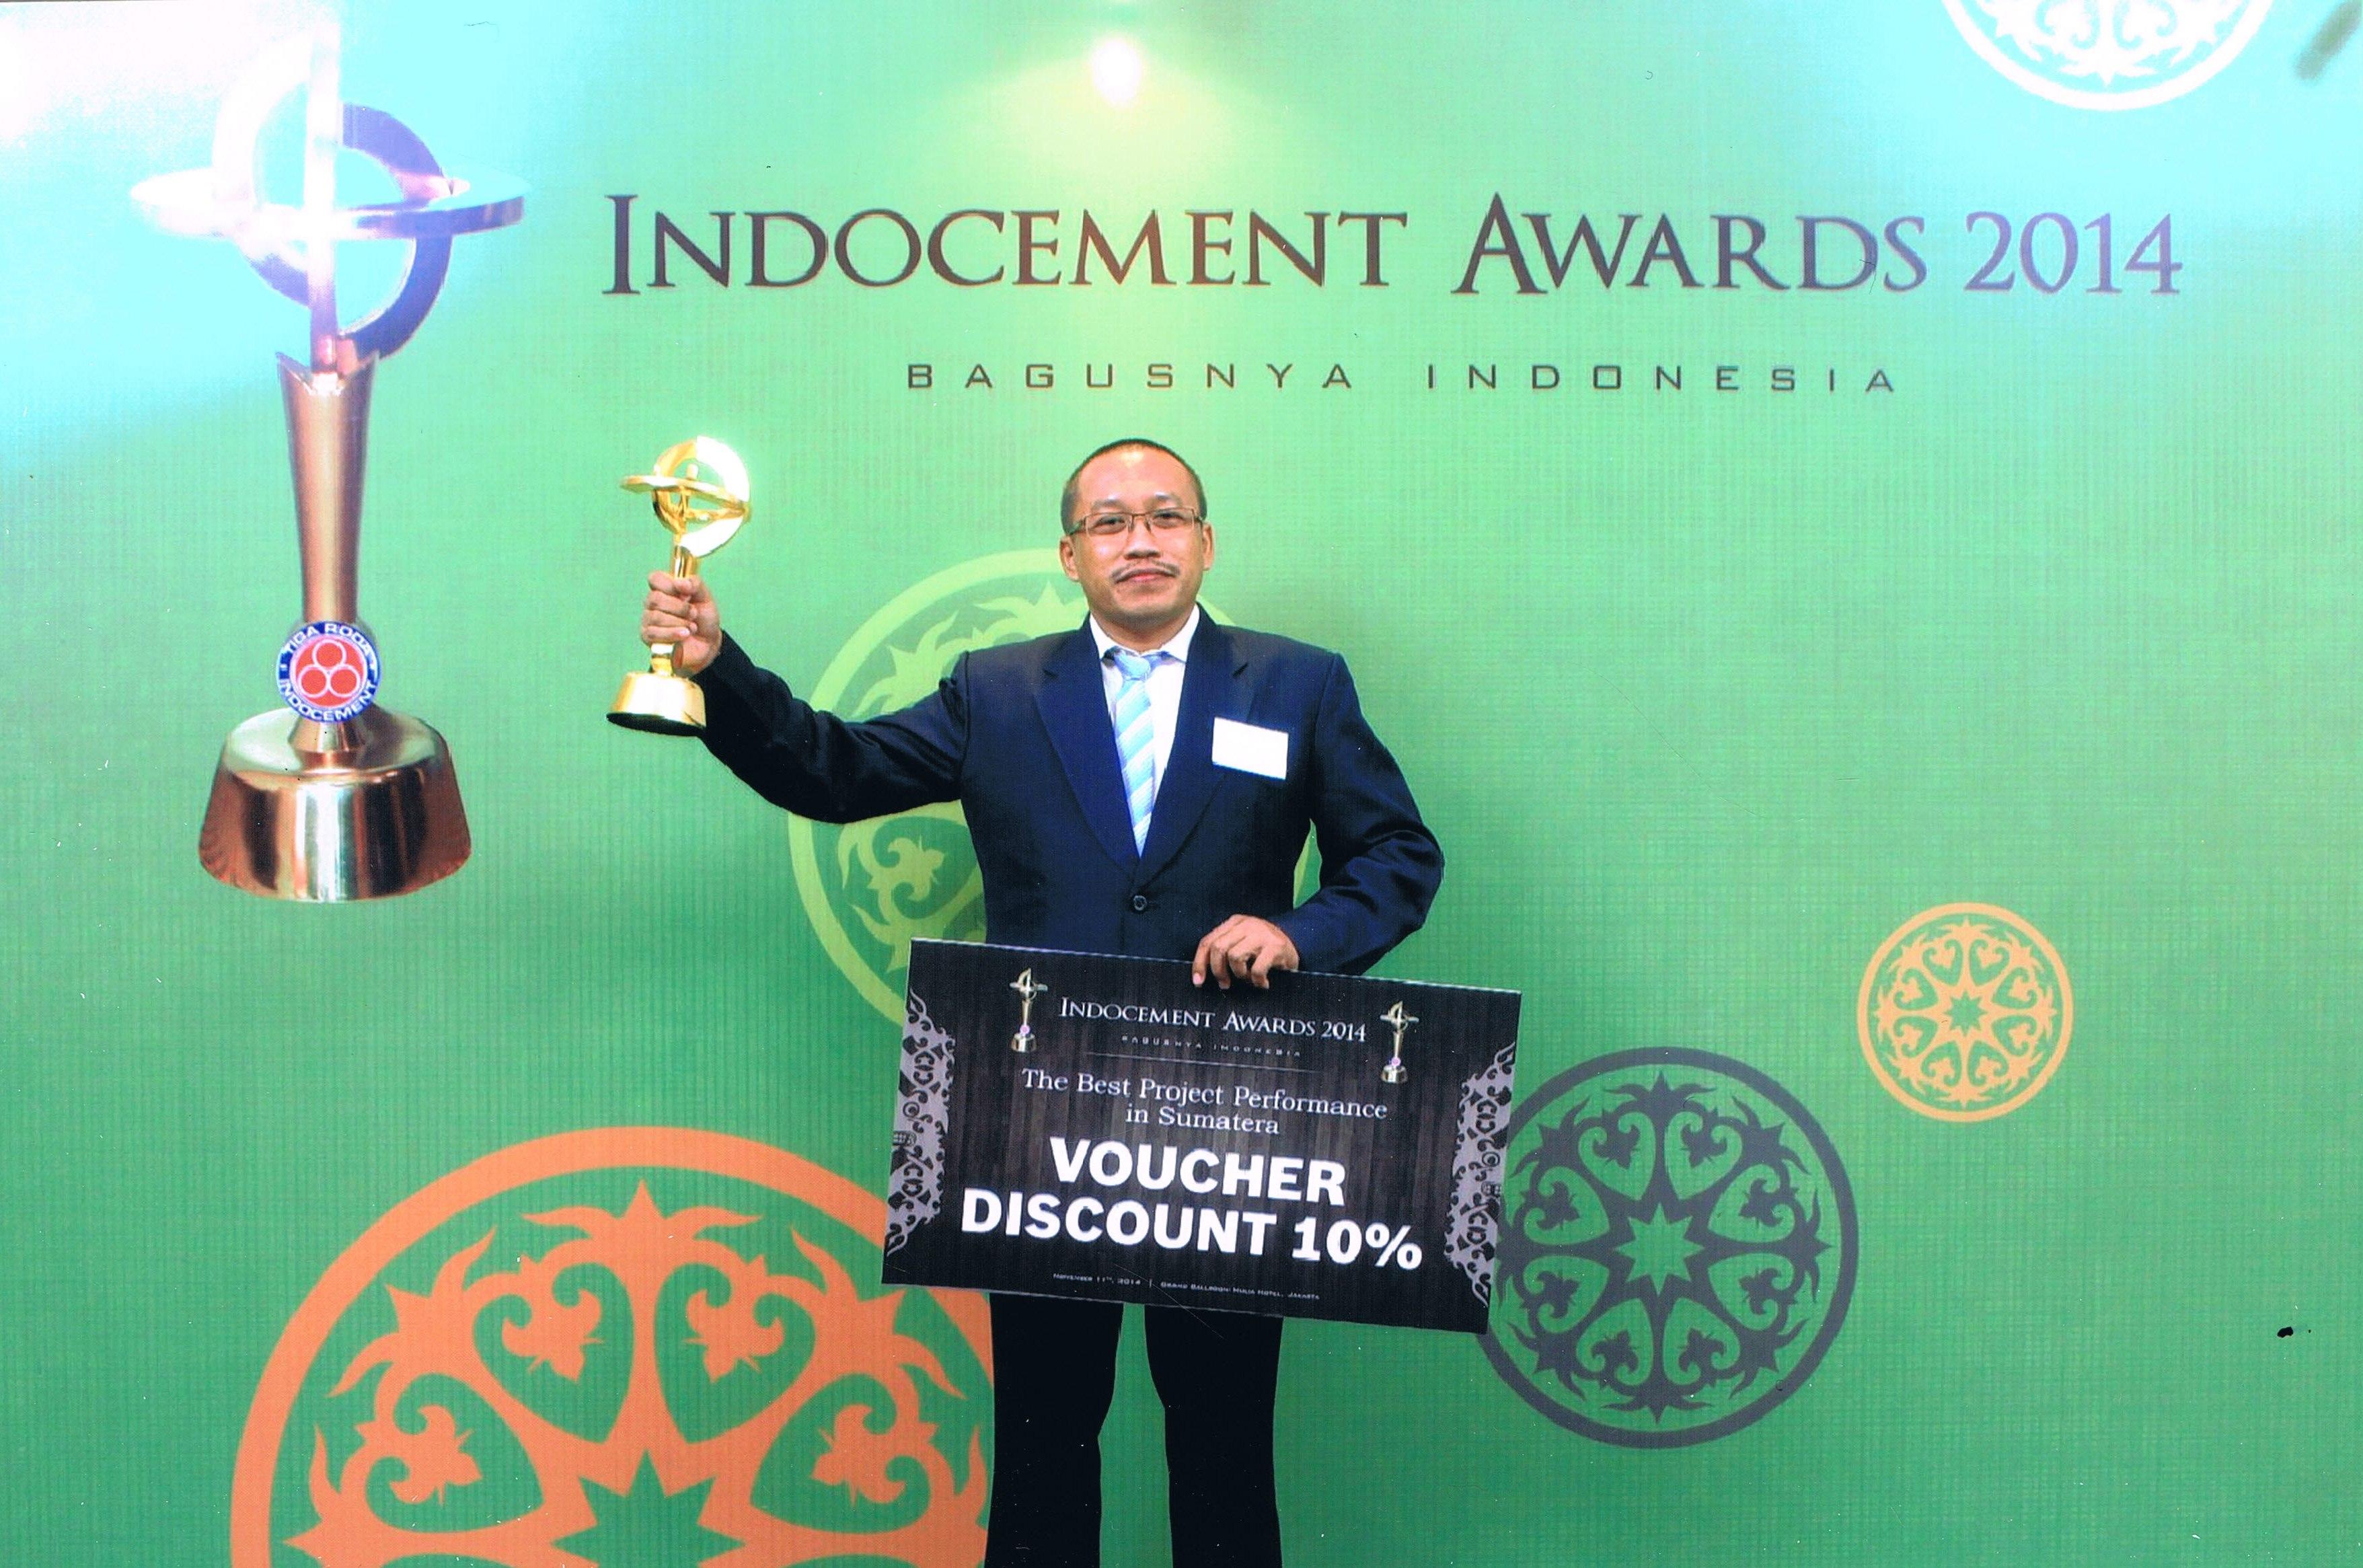 indocement awards1-214112014_0000-rev2